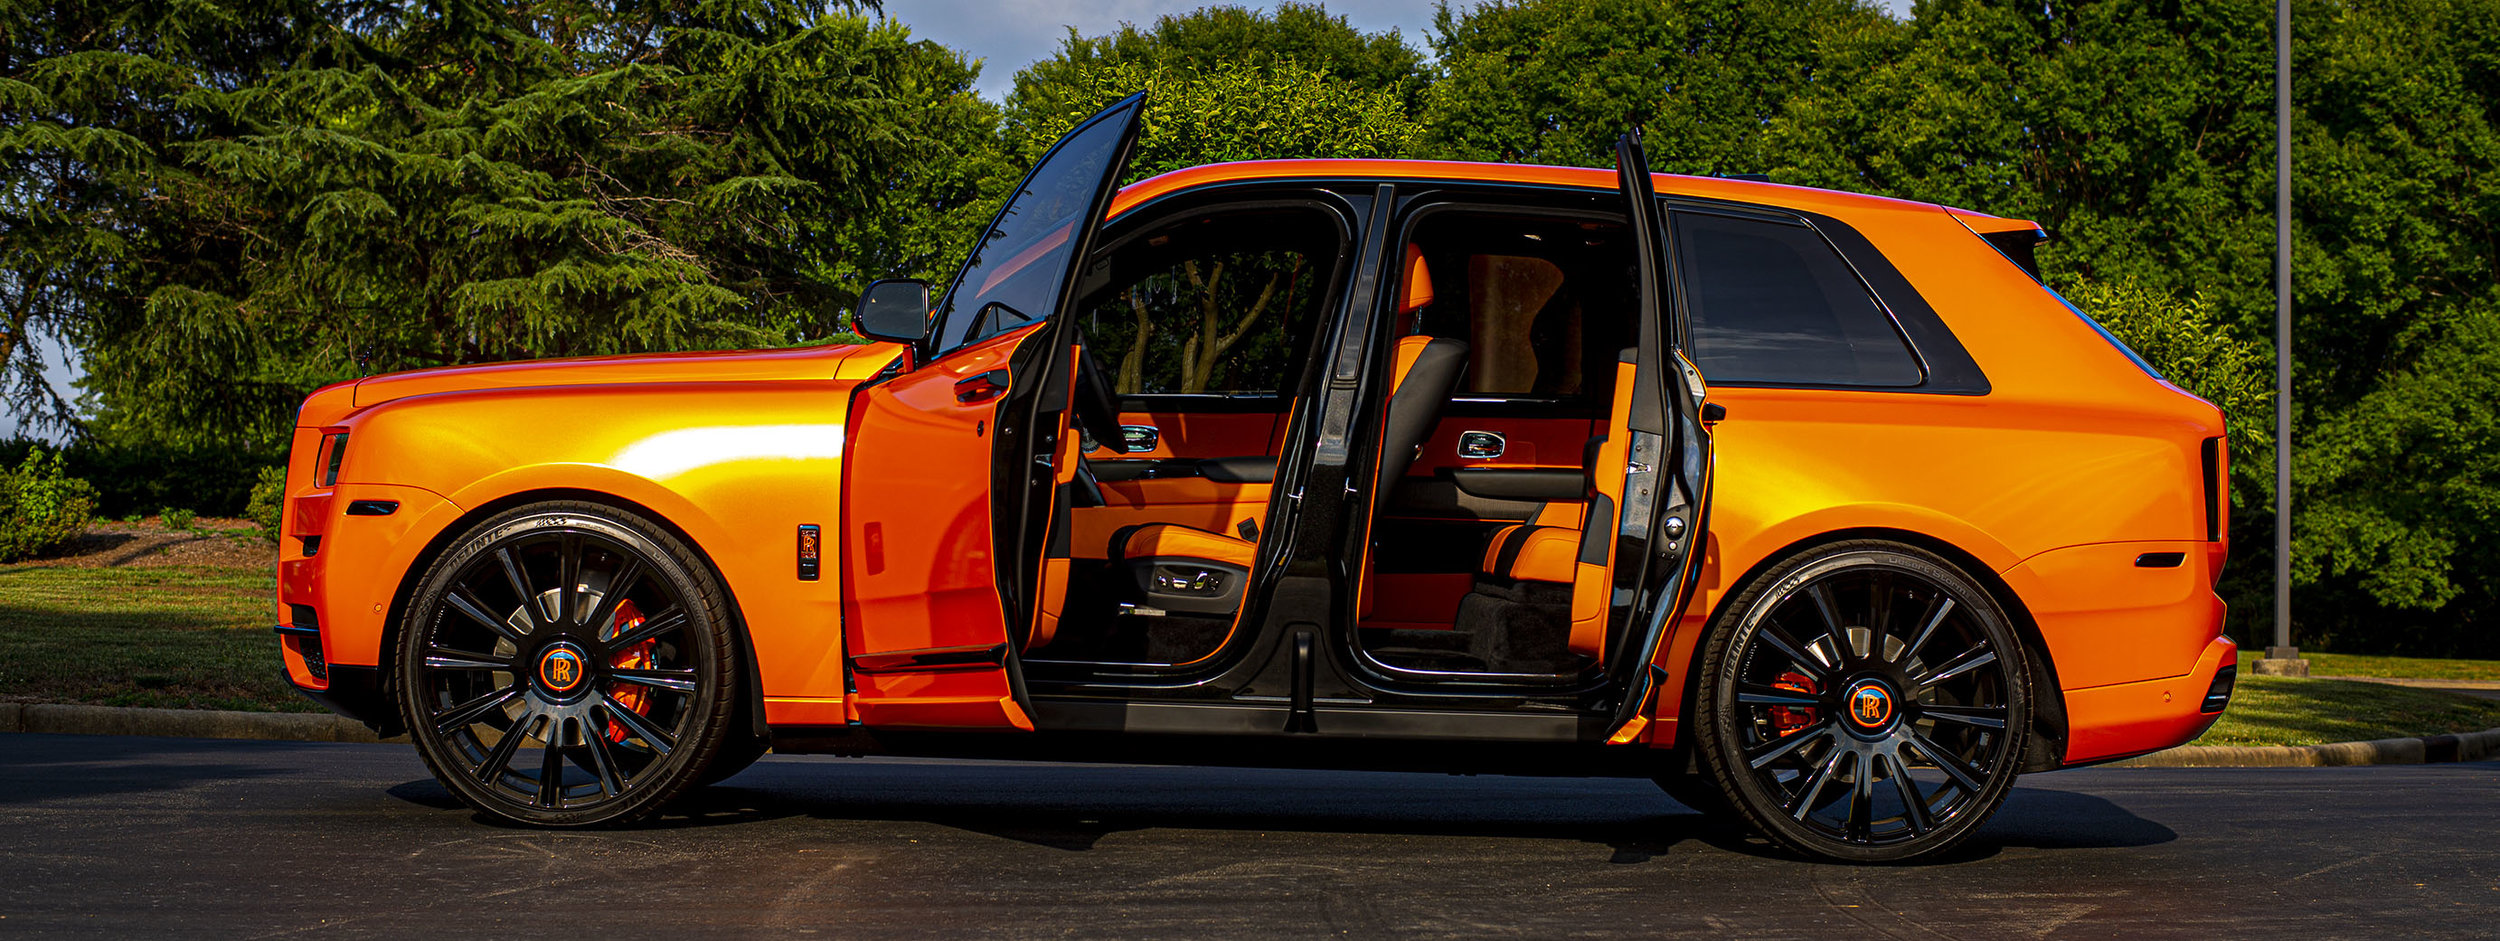 OBJ-Orange-Rolls-Royce-Cullinan.jpg